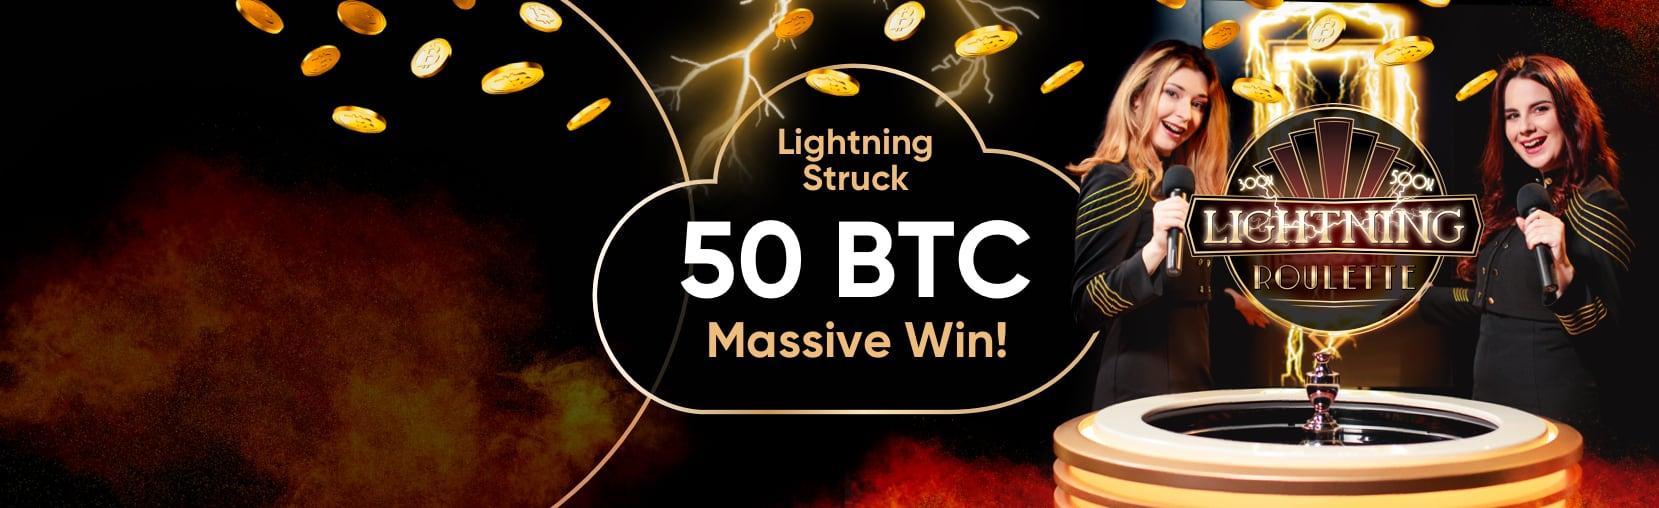 50 BTC Bitcoin Lightning Roulette Win